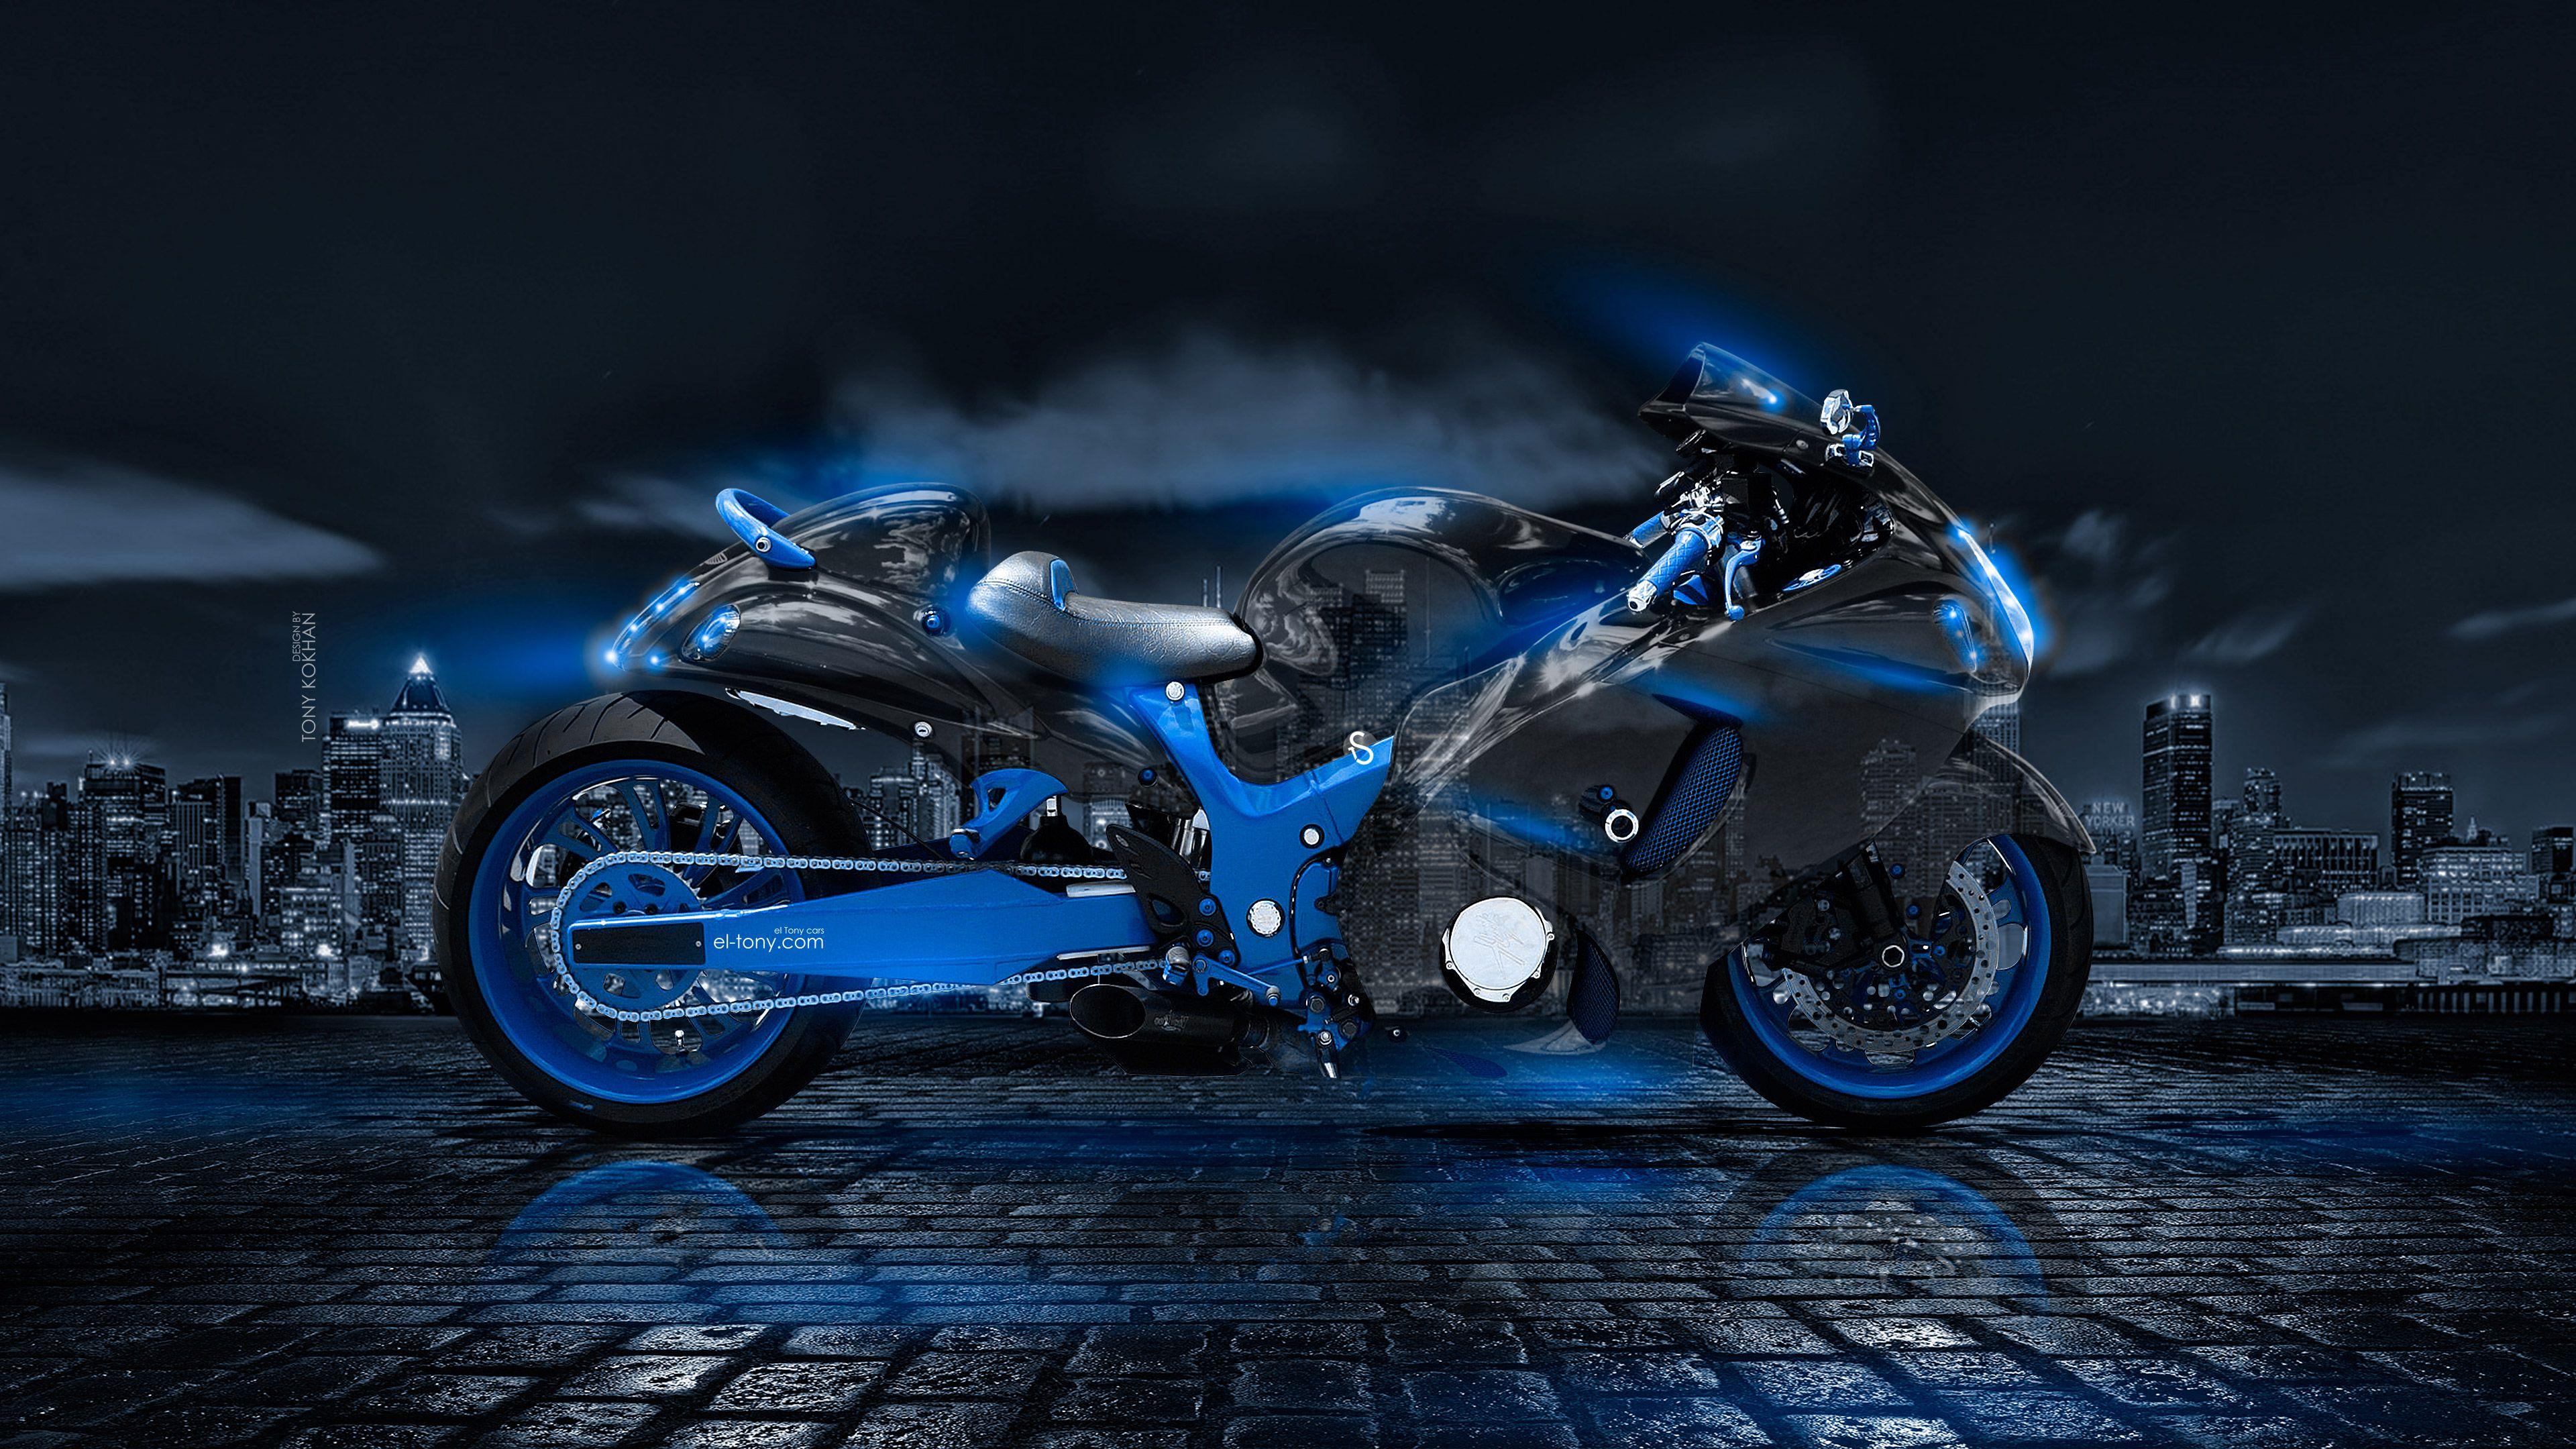 Superb 2018, Bike, Black, Blue, City, Crystal, El Tony Cars,